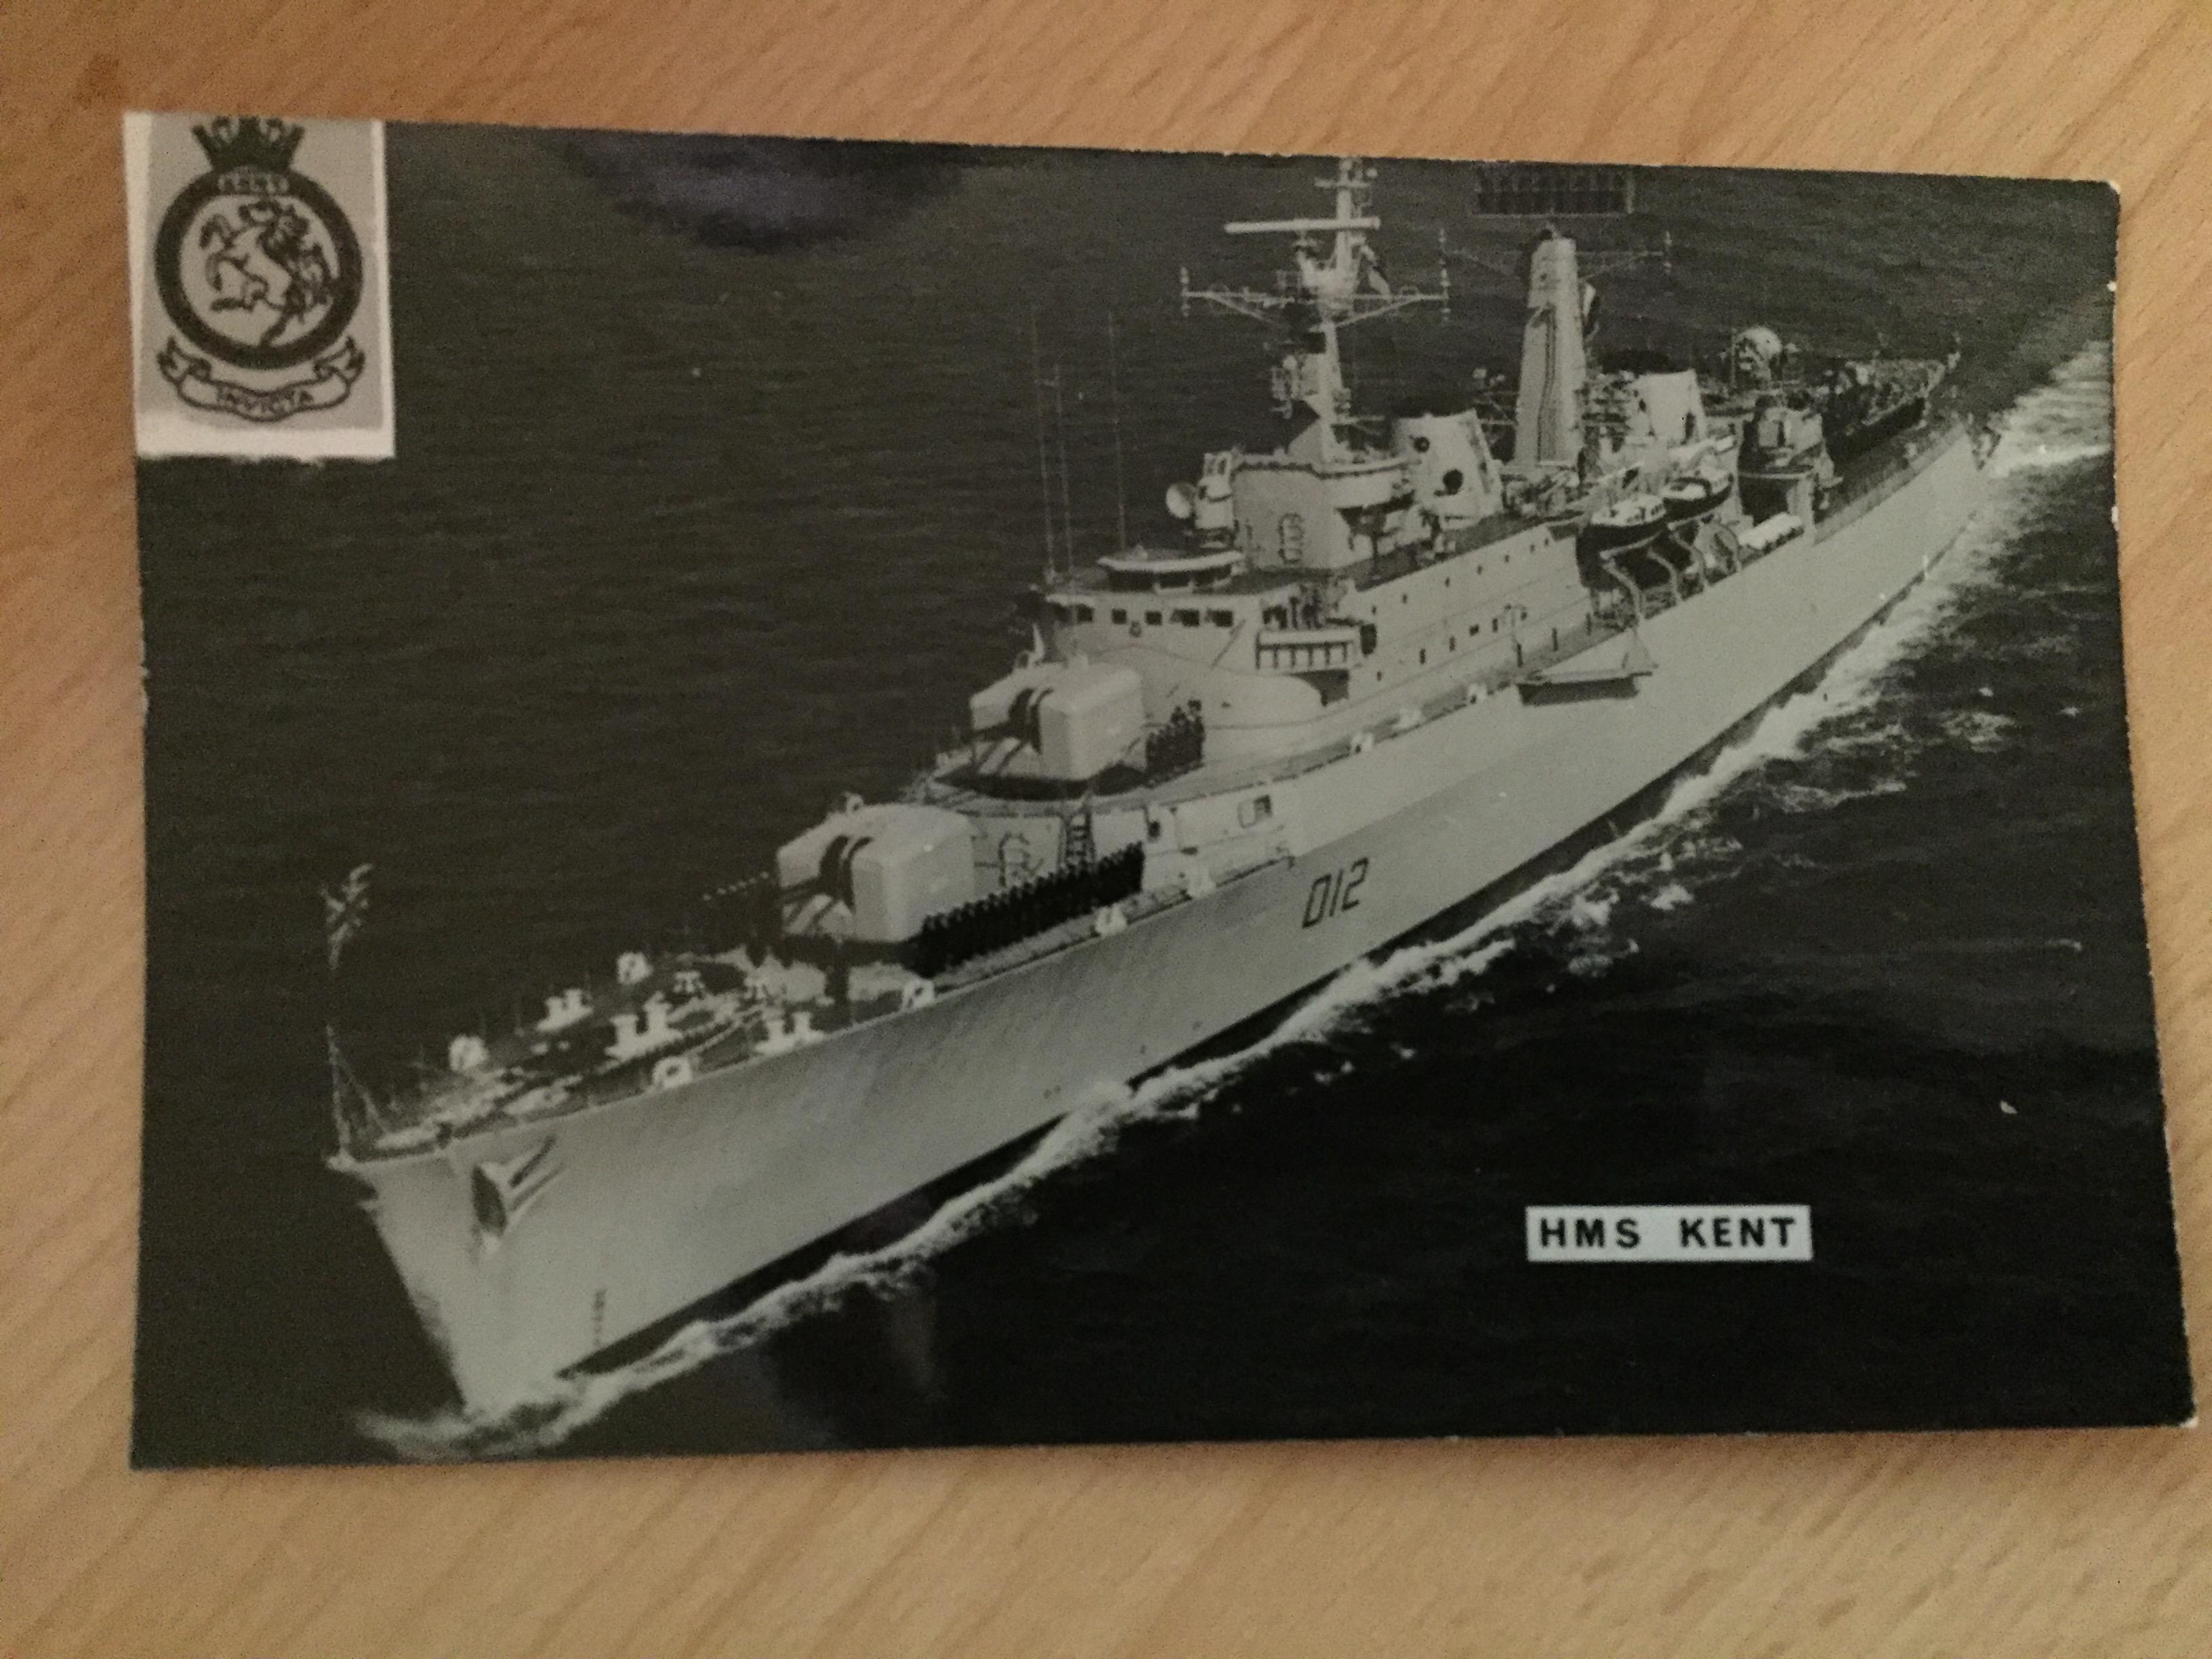 POSTCARD SIZE PHOTO OF THE ROYAL NAVAL VESSEL THE HMS KENT